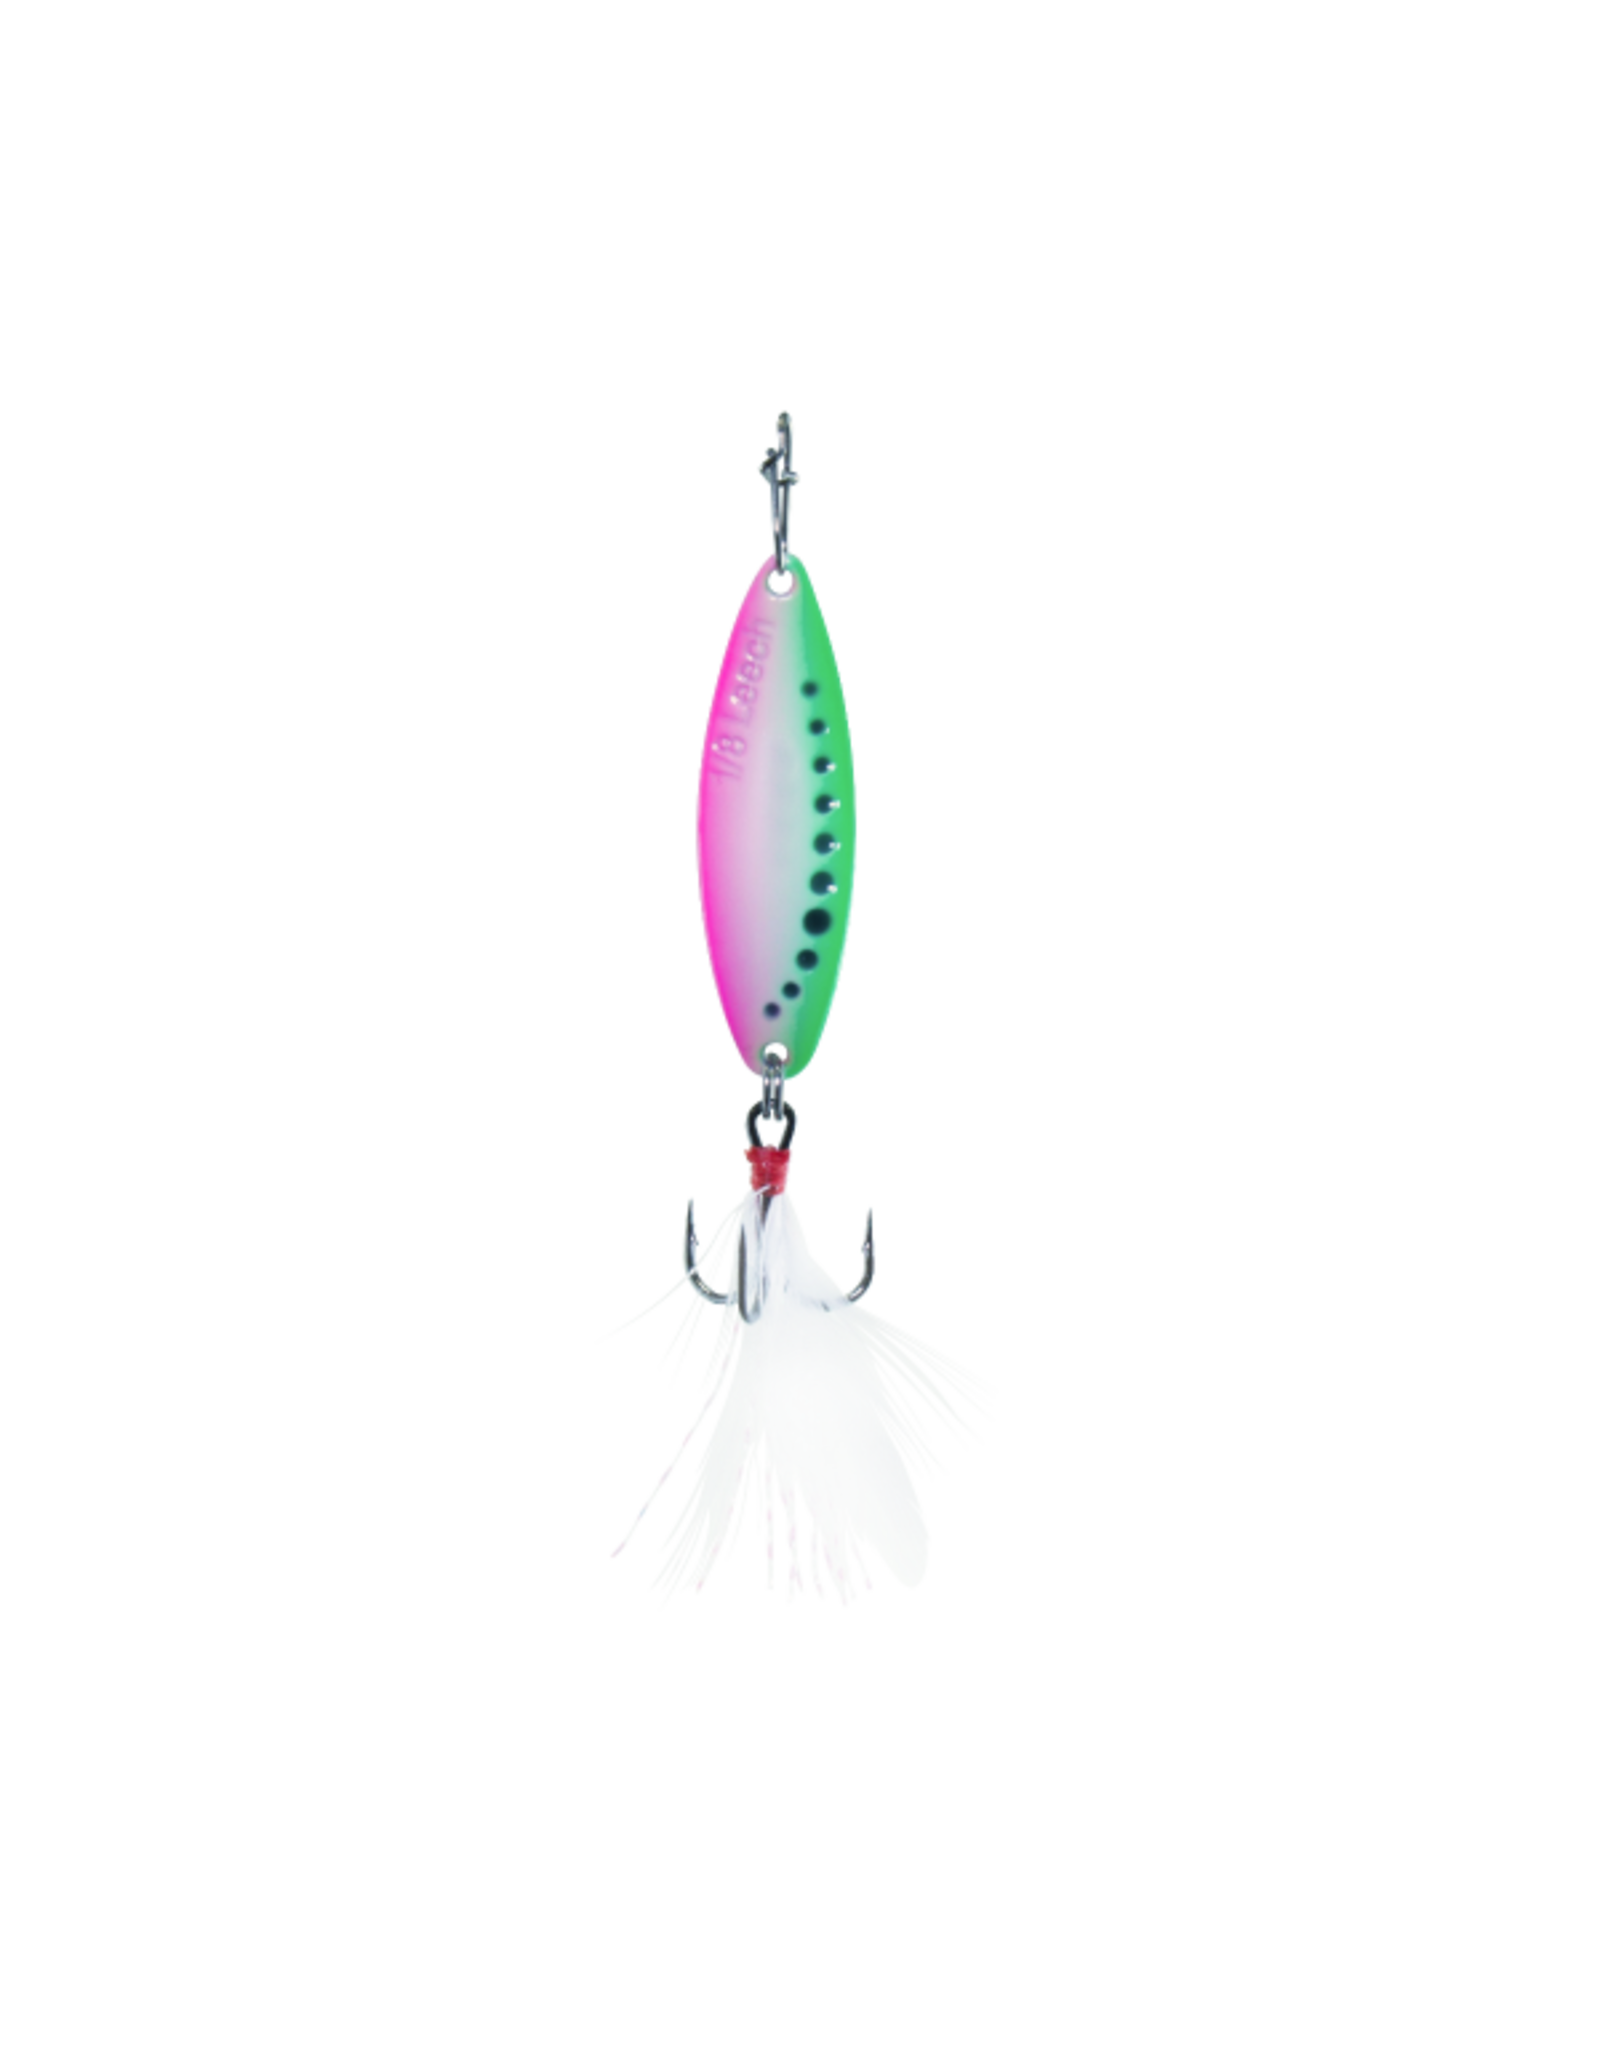 Clam Clam Leech Flutter Spoon Kit (3pk)